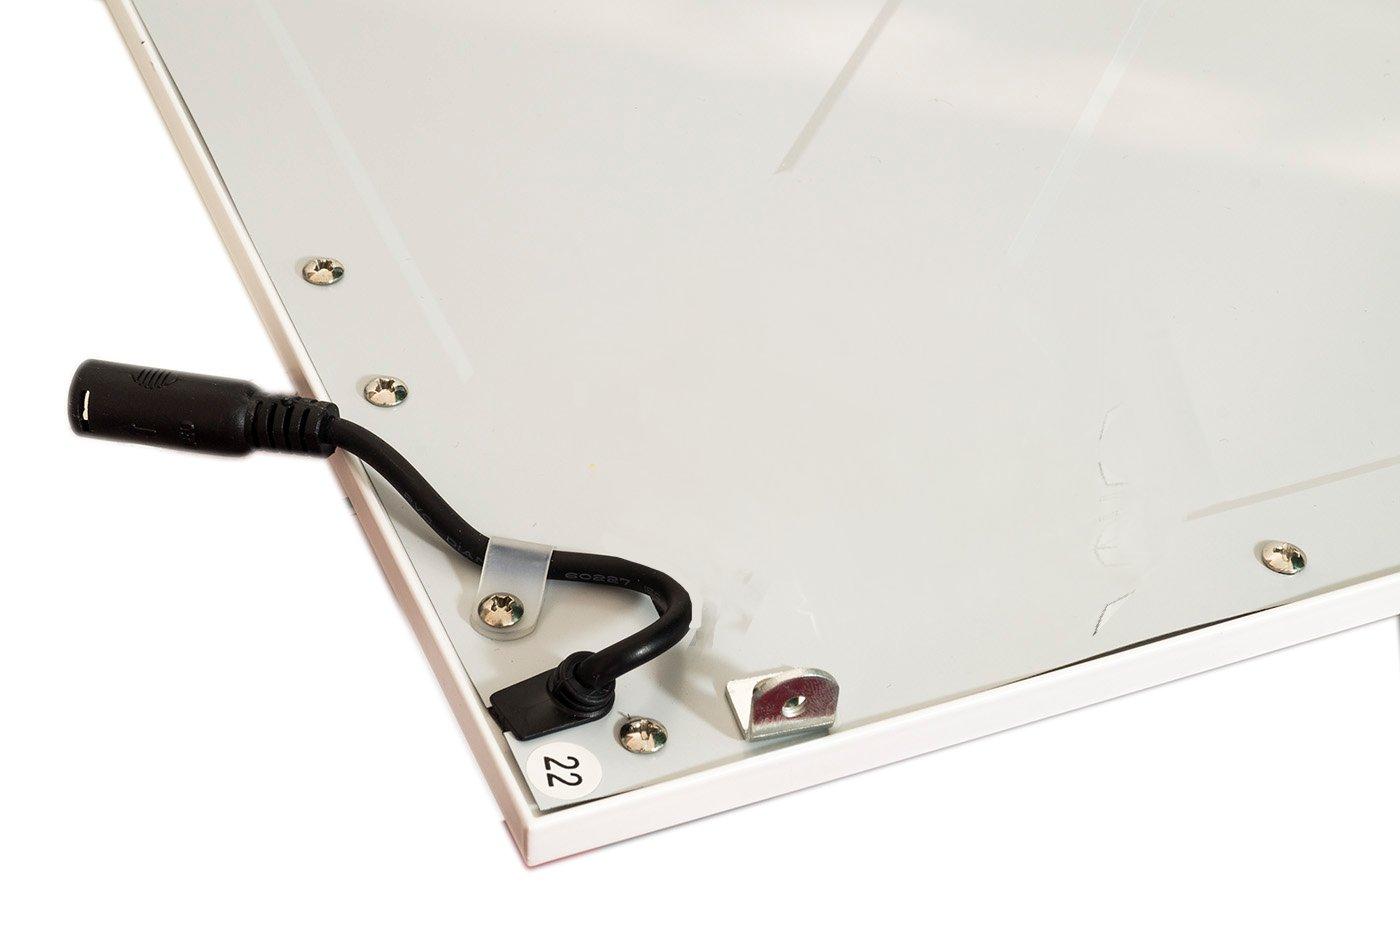 Plafoniere Da Incasso 60x60 : Bes 19511 pannelli kodak beselettronica pannello led 60x60